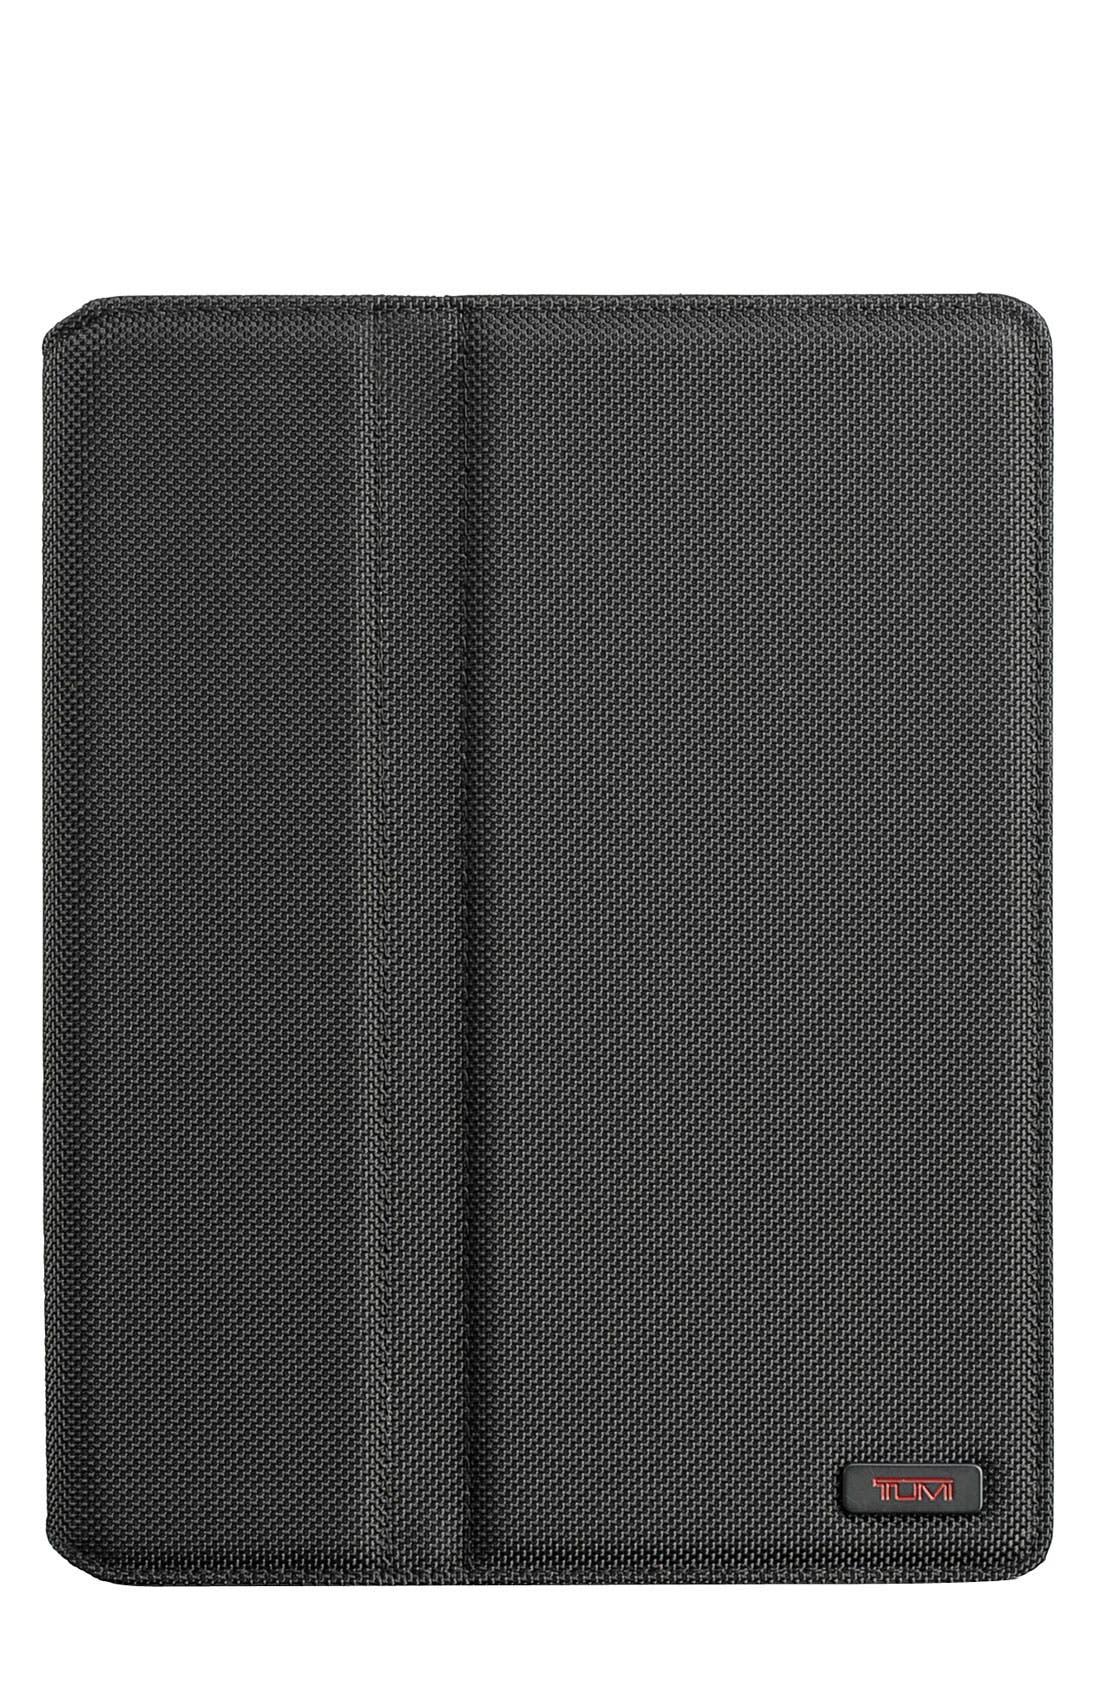 Ballistic Nylon iPad 2 Cover,                         Main,                         color, Black